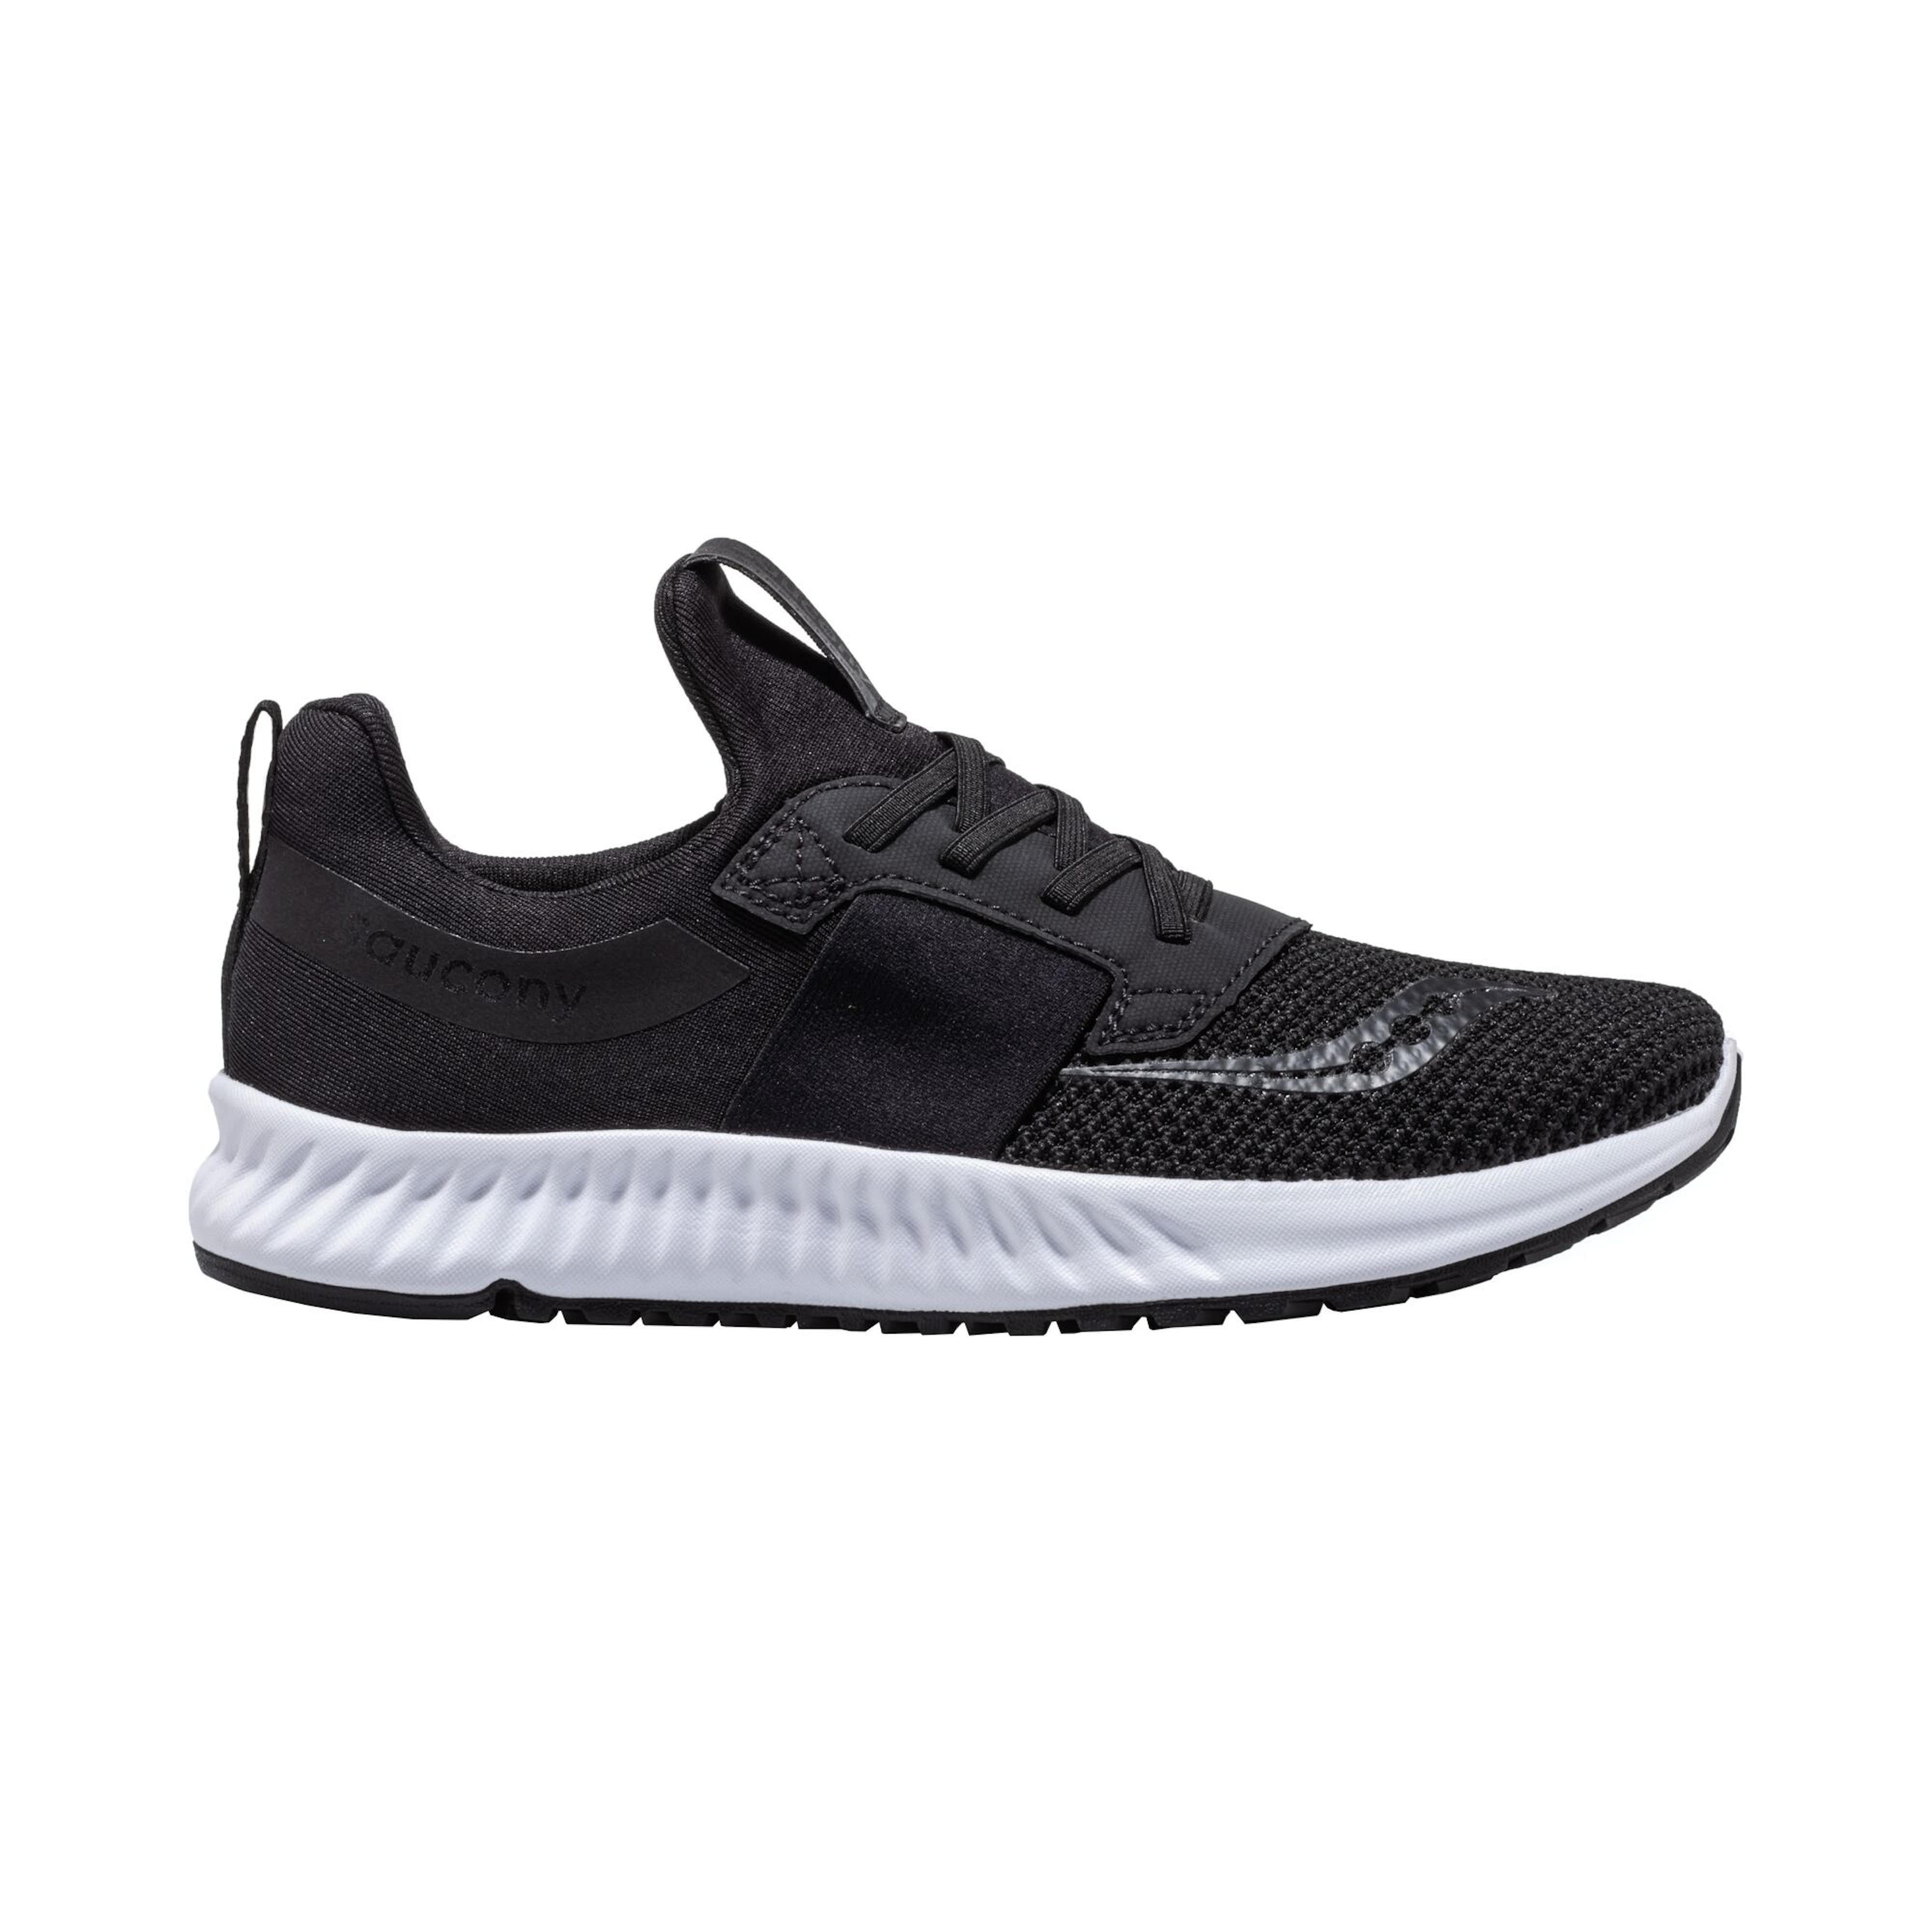 84ec7a5d Saucony Shoes | Trail Running Shoes for Men & Women | NZ